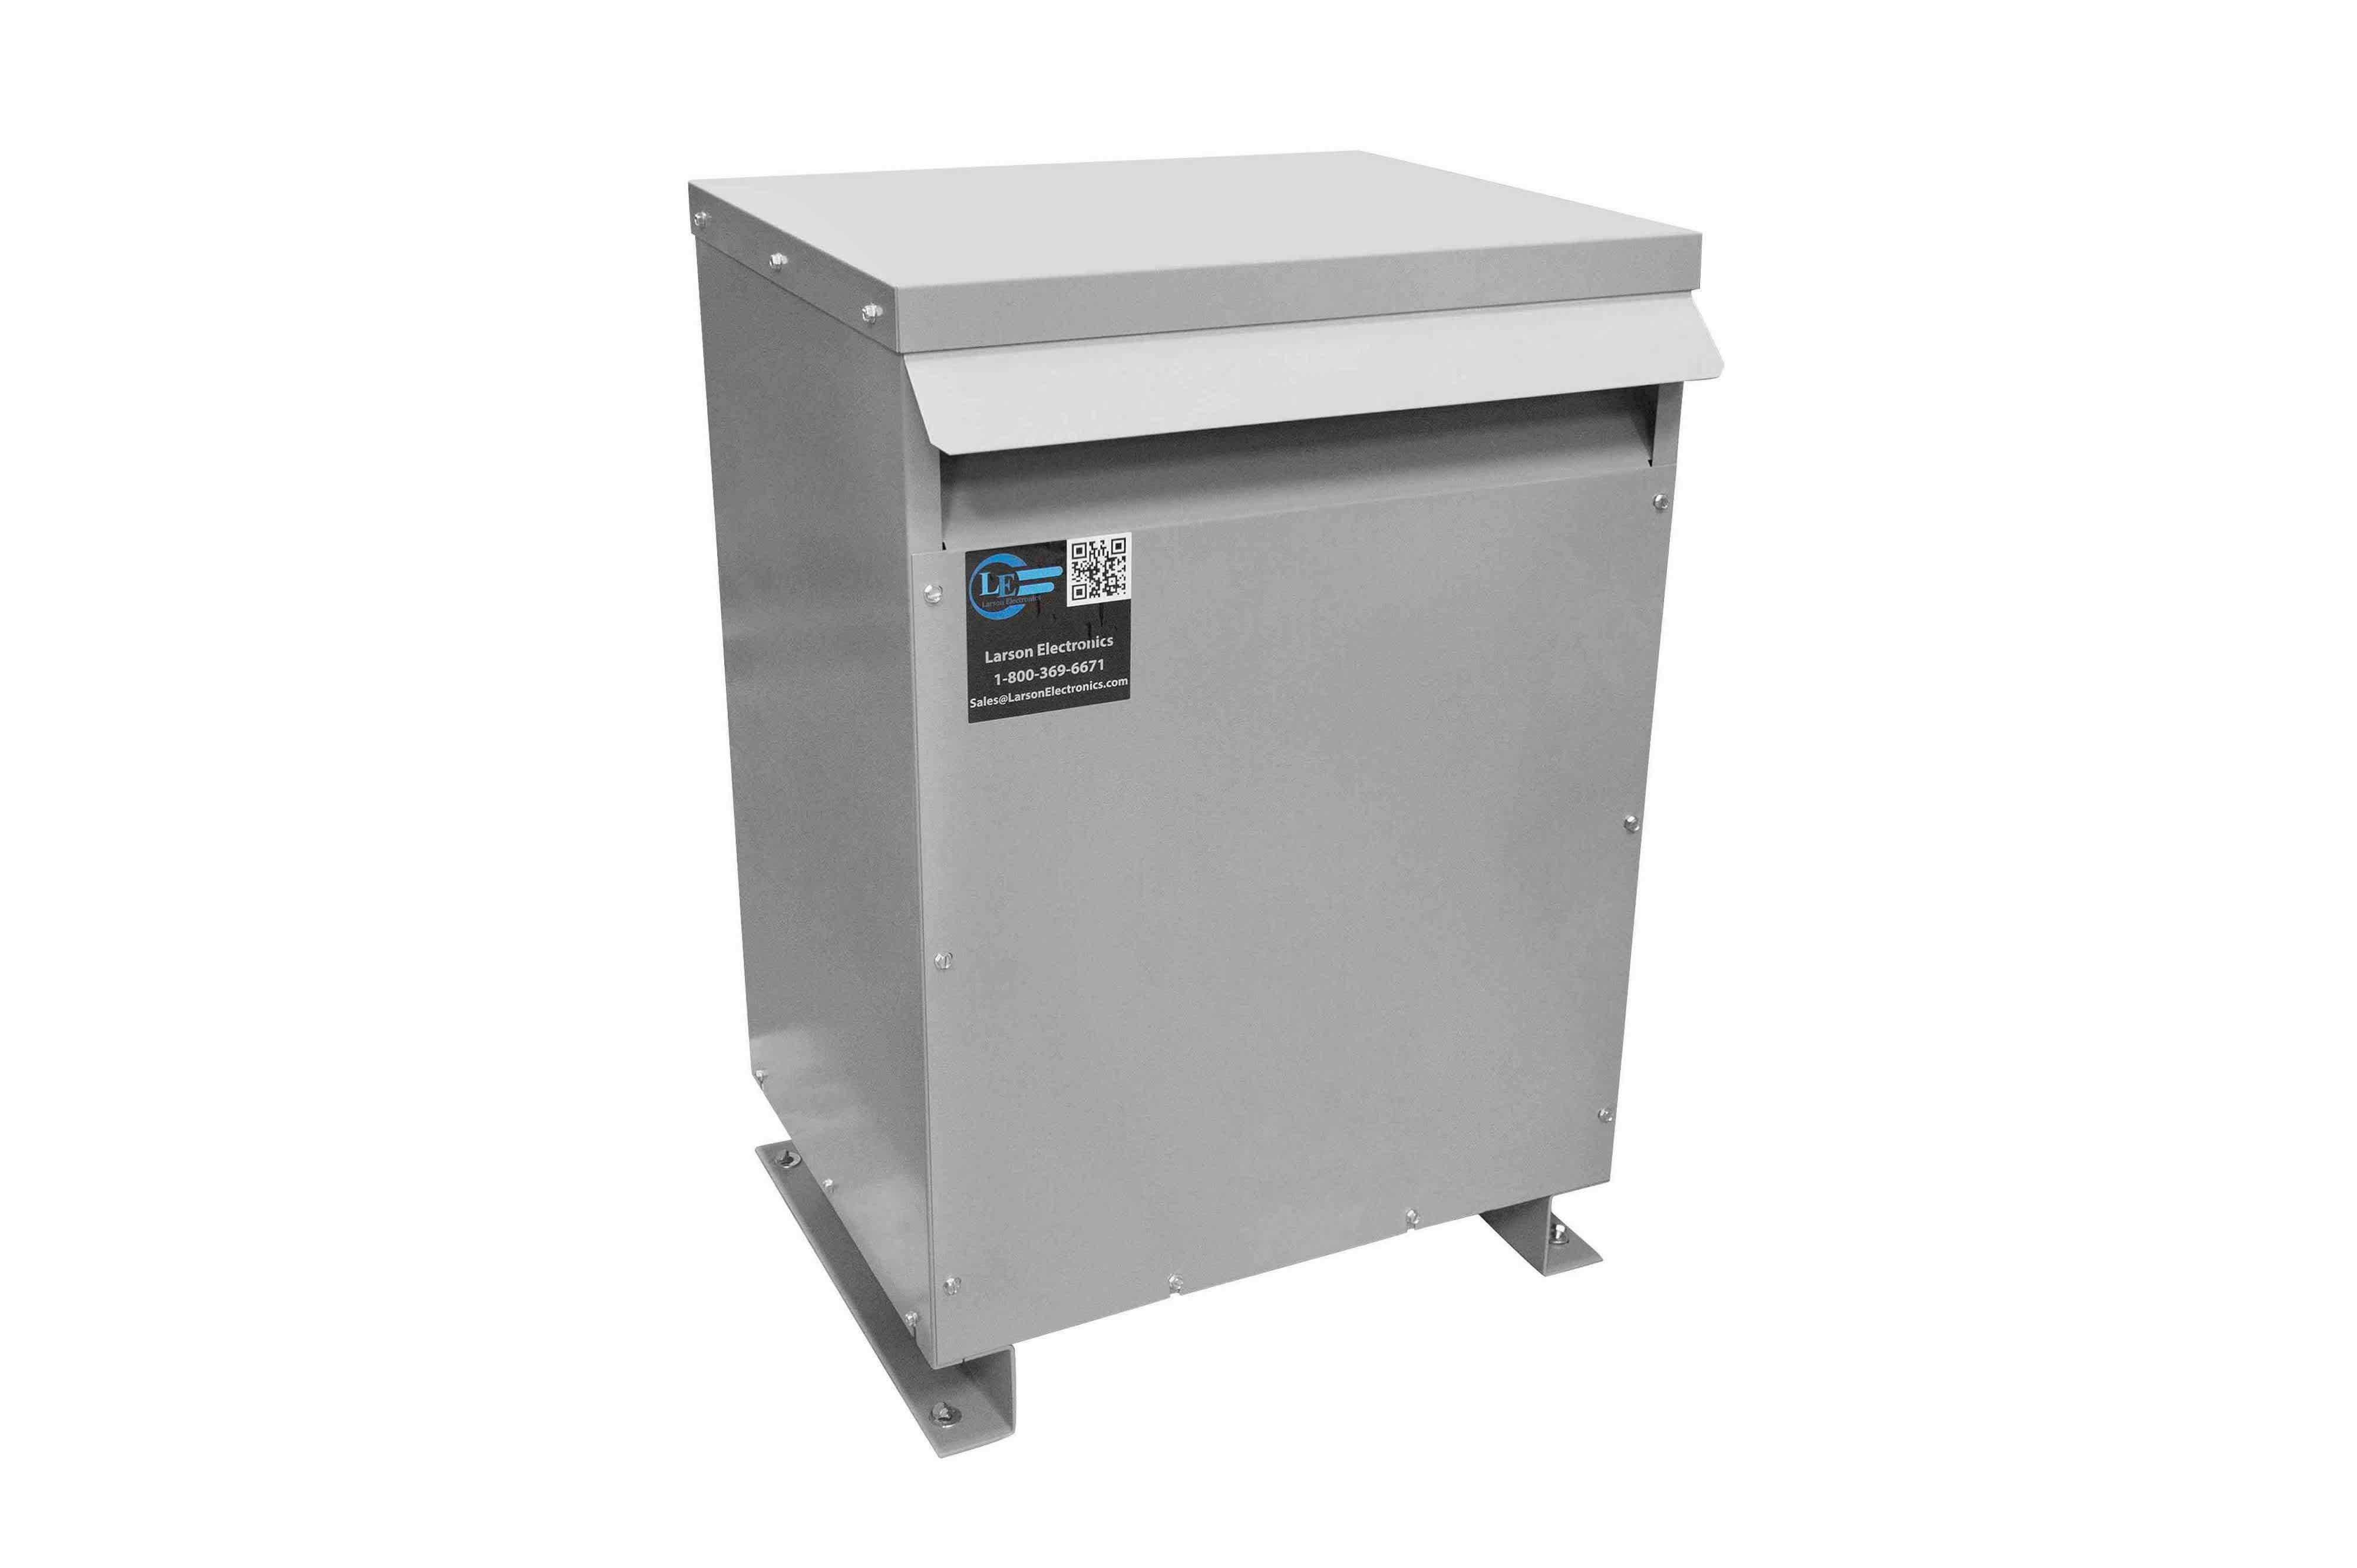 225 kVA 3PH DOE Transformer, 400V Delta Primary, 480Y/277 Wye-N Secondary, N3R, Ventilated, 60 Hz